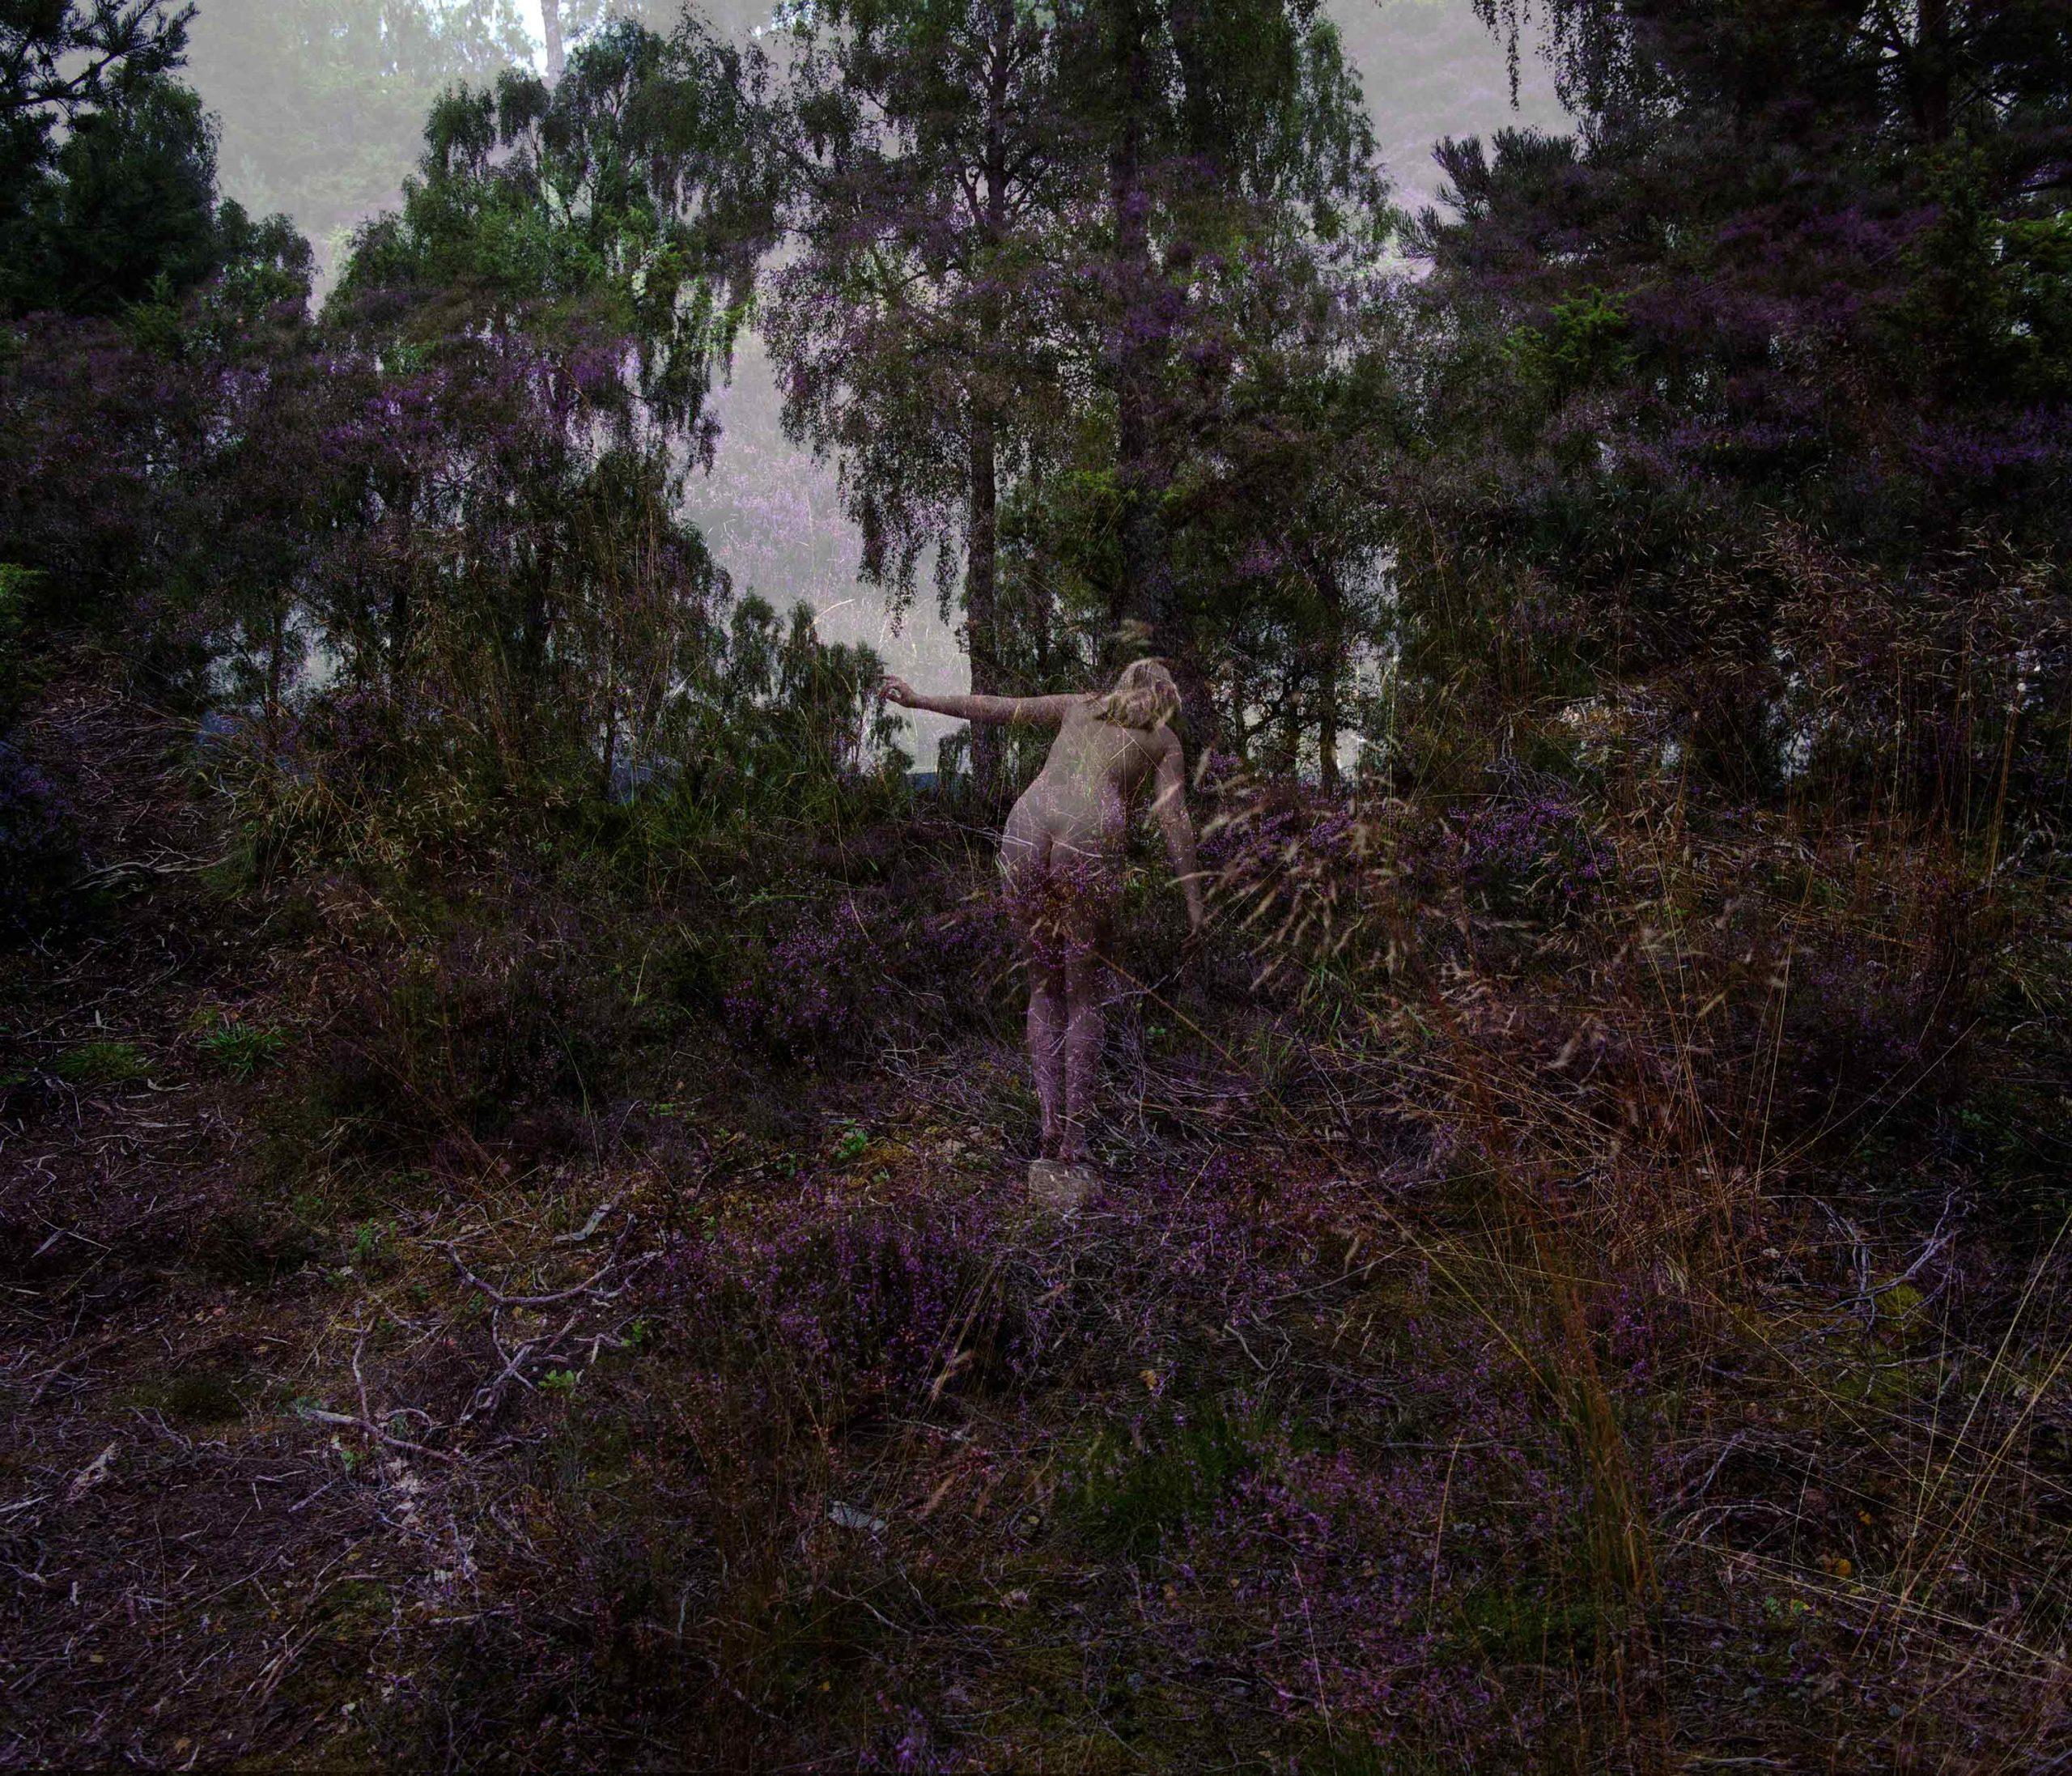 Wren-Agency-Rachel-Louise-Brown-Self As Other - 03